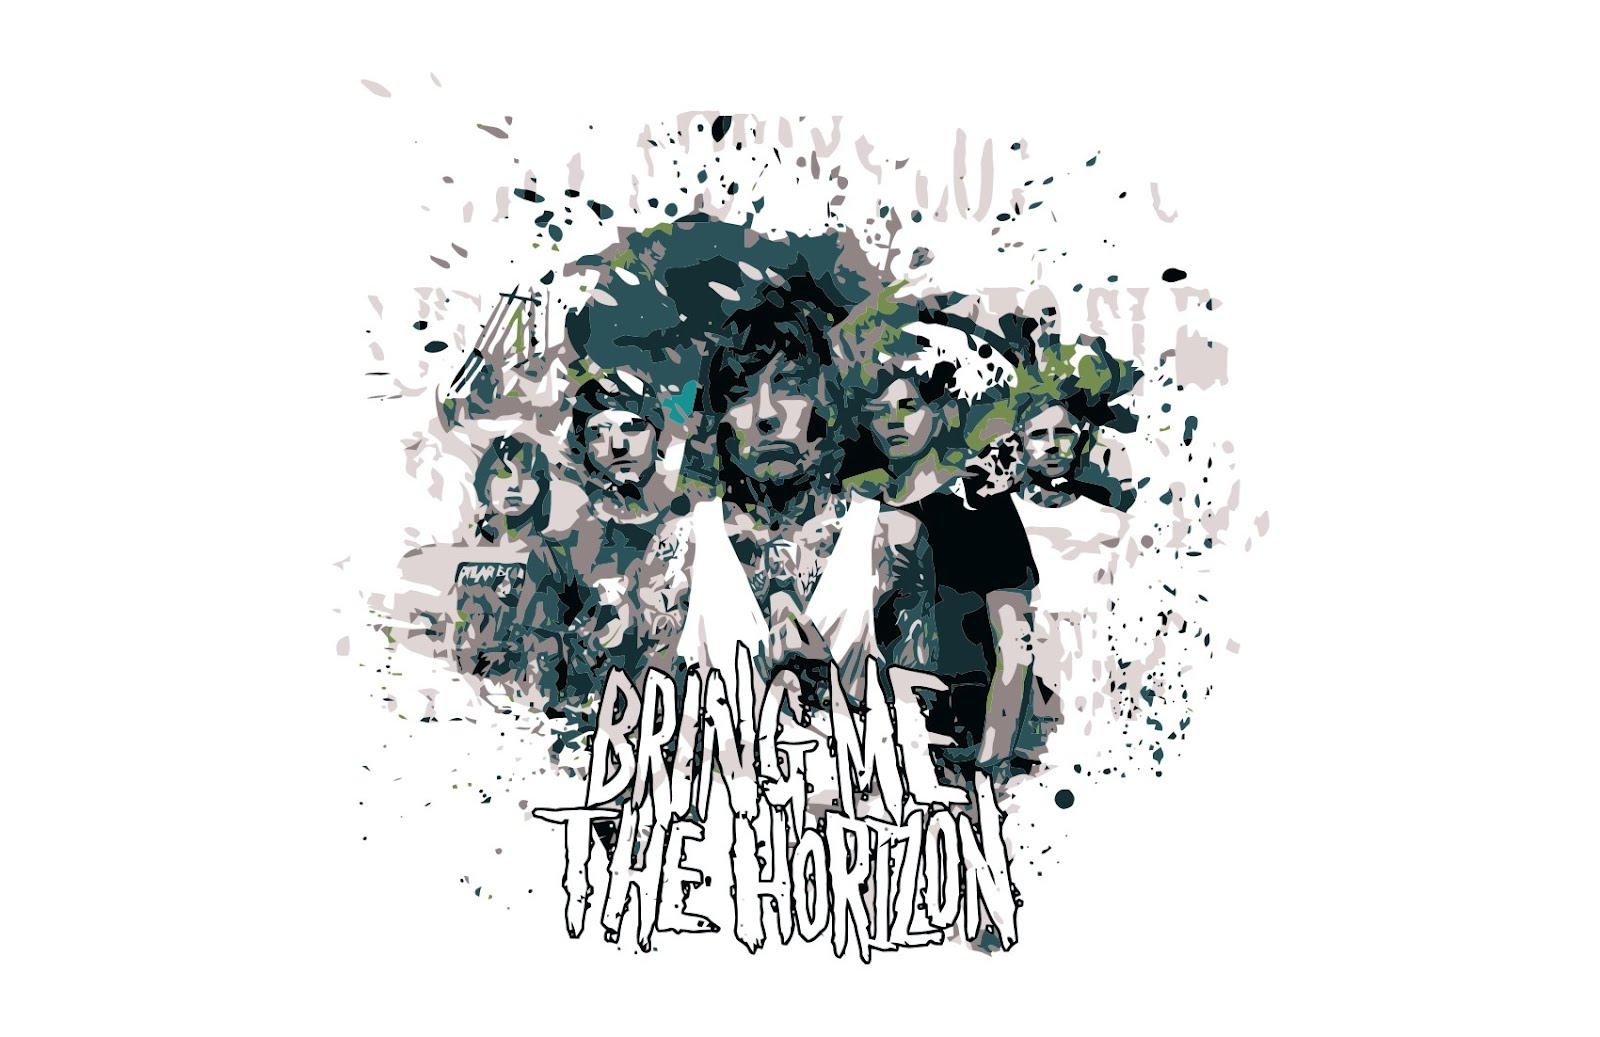 bring_me_the_horizon-group_band_back_vector